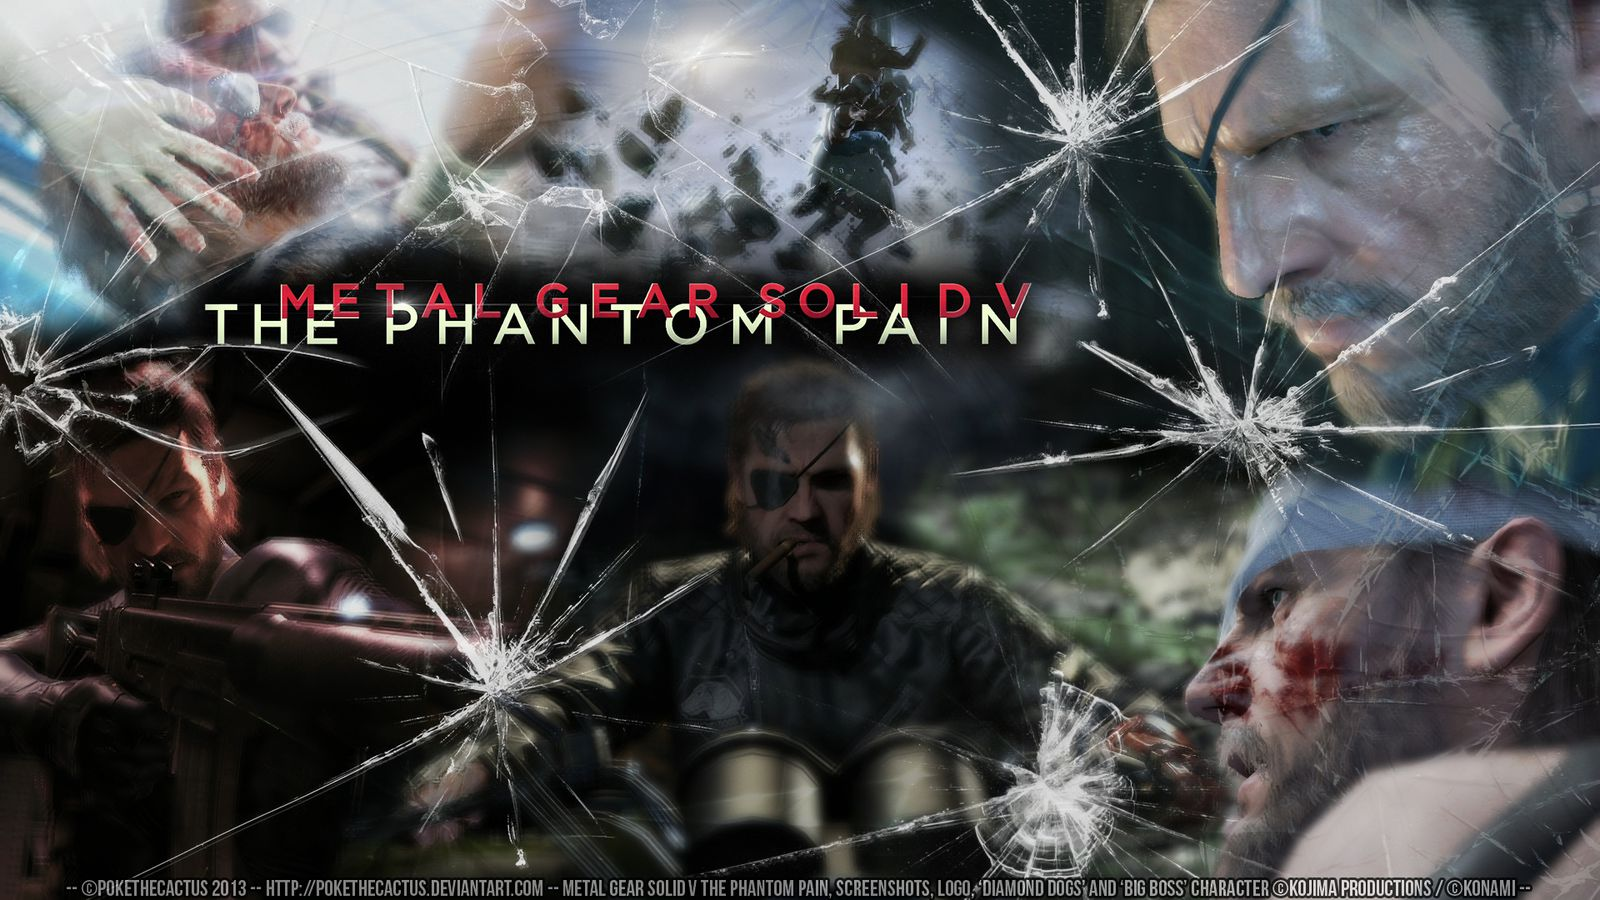 [E3 2013] [màj] Metal Gear Solid V s'annonce sur Xbox One